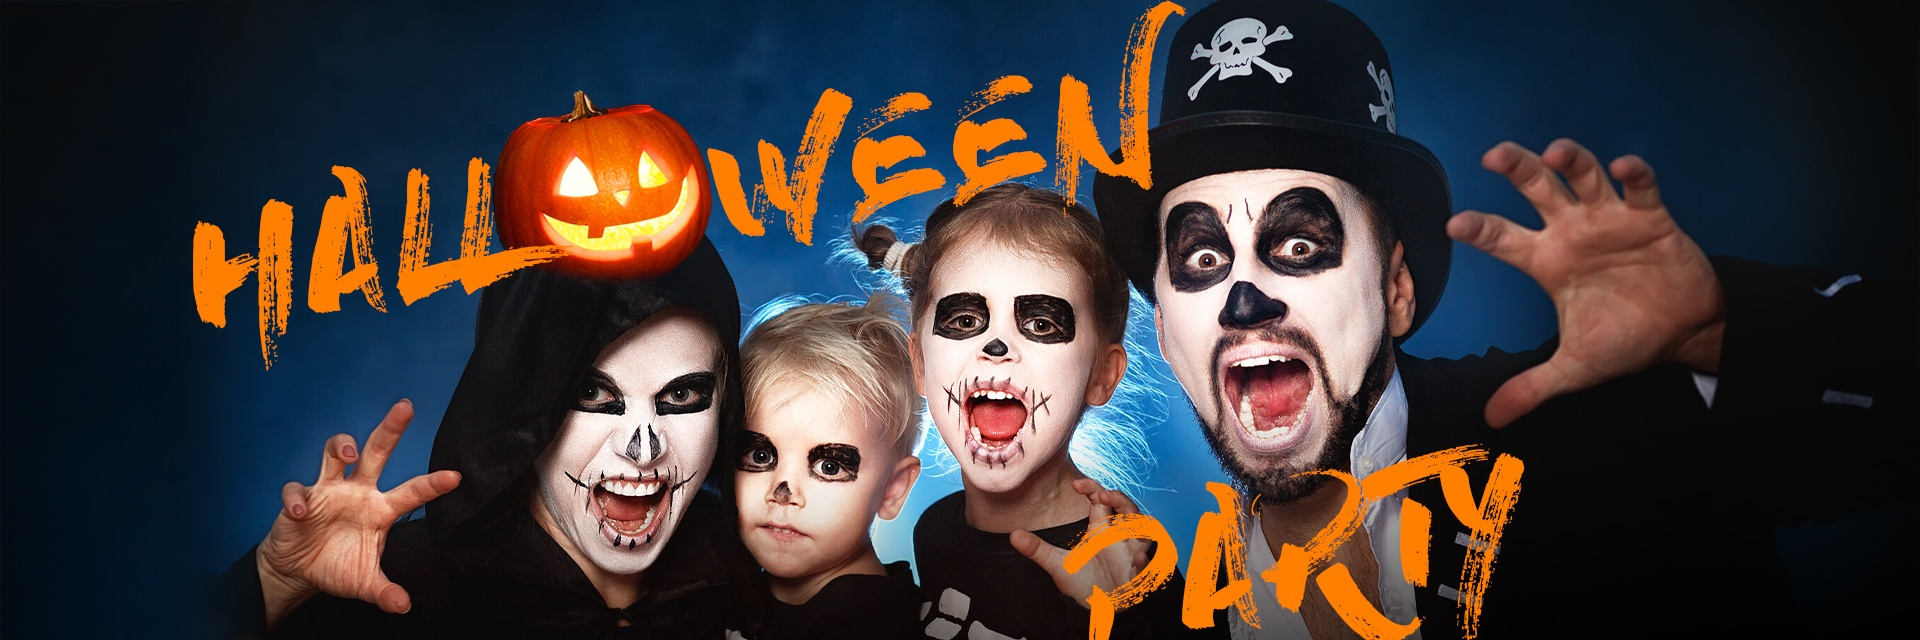 Halloween Party в NEMO в RESORT & SPA HOTEL NEMO, фото № 1